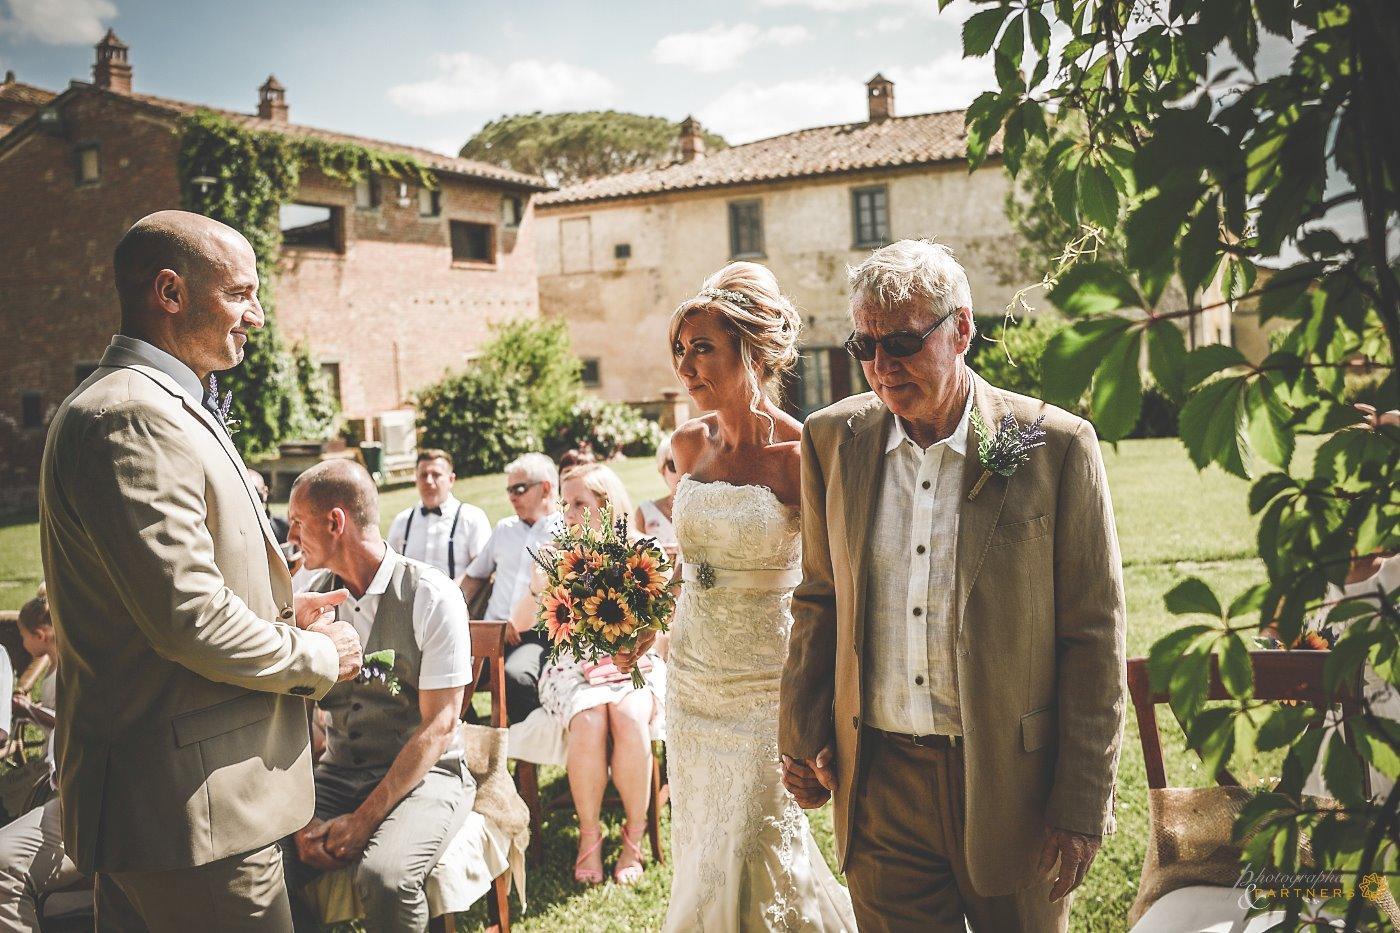 photographers_tuscany_06.jpg